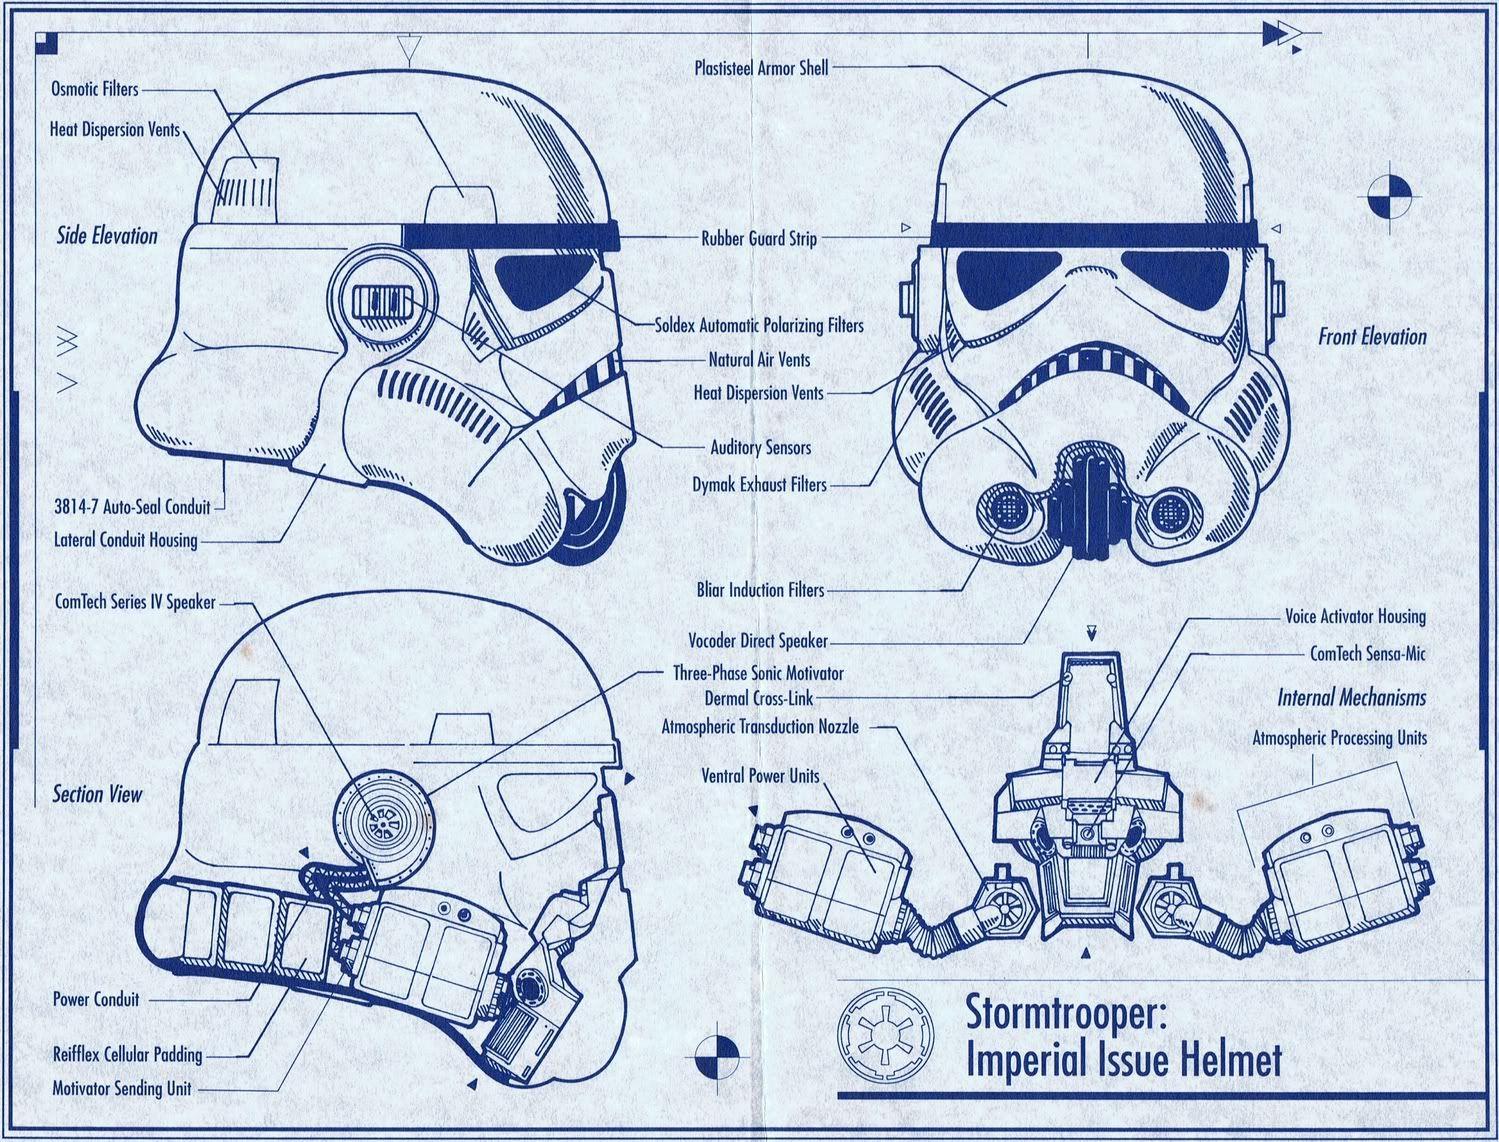 Stormtrooper armor star starwars and star wars stuff riddelltkbp malvernweather Images